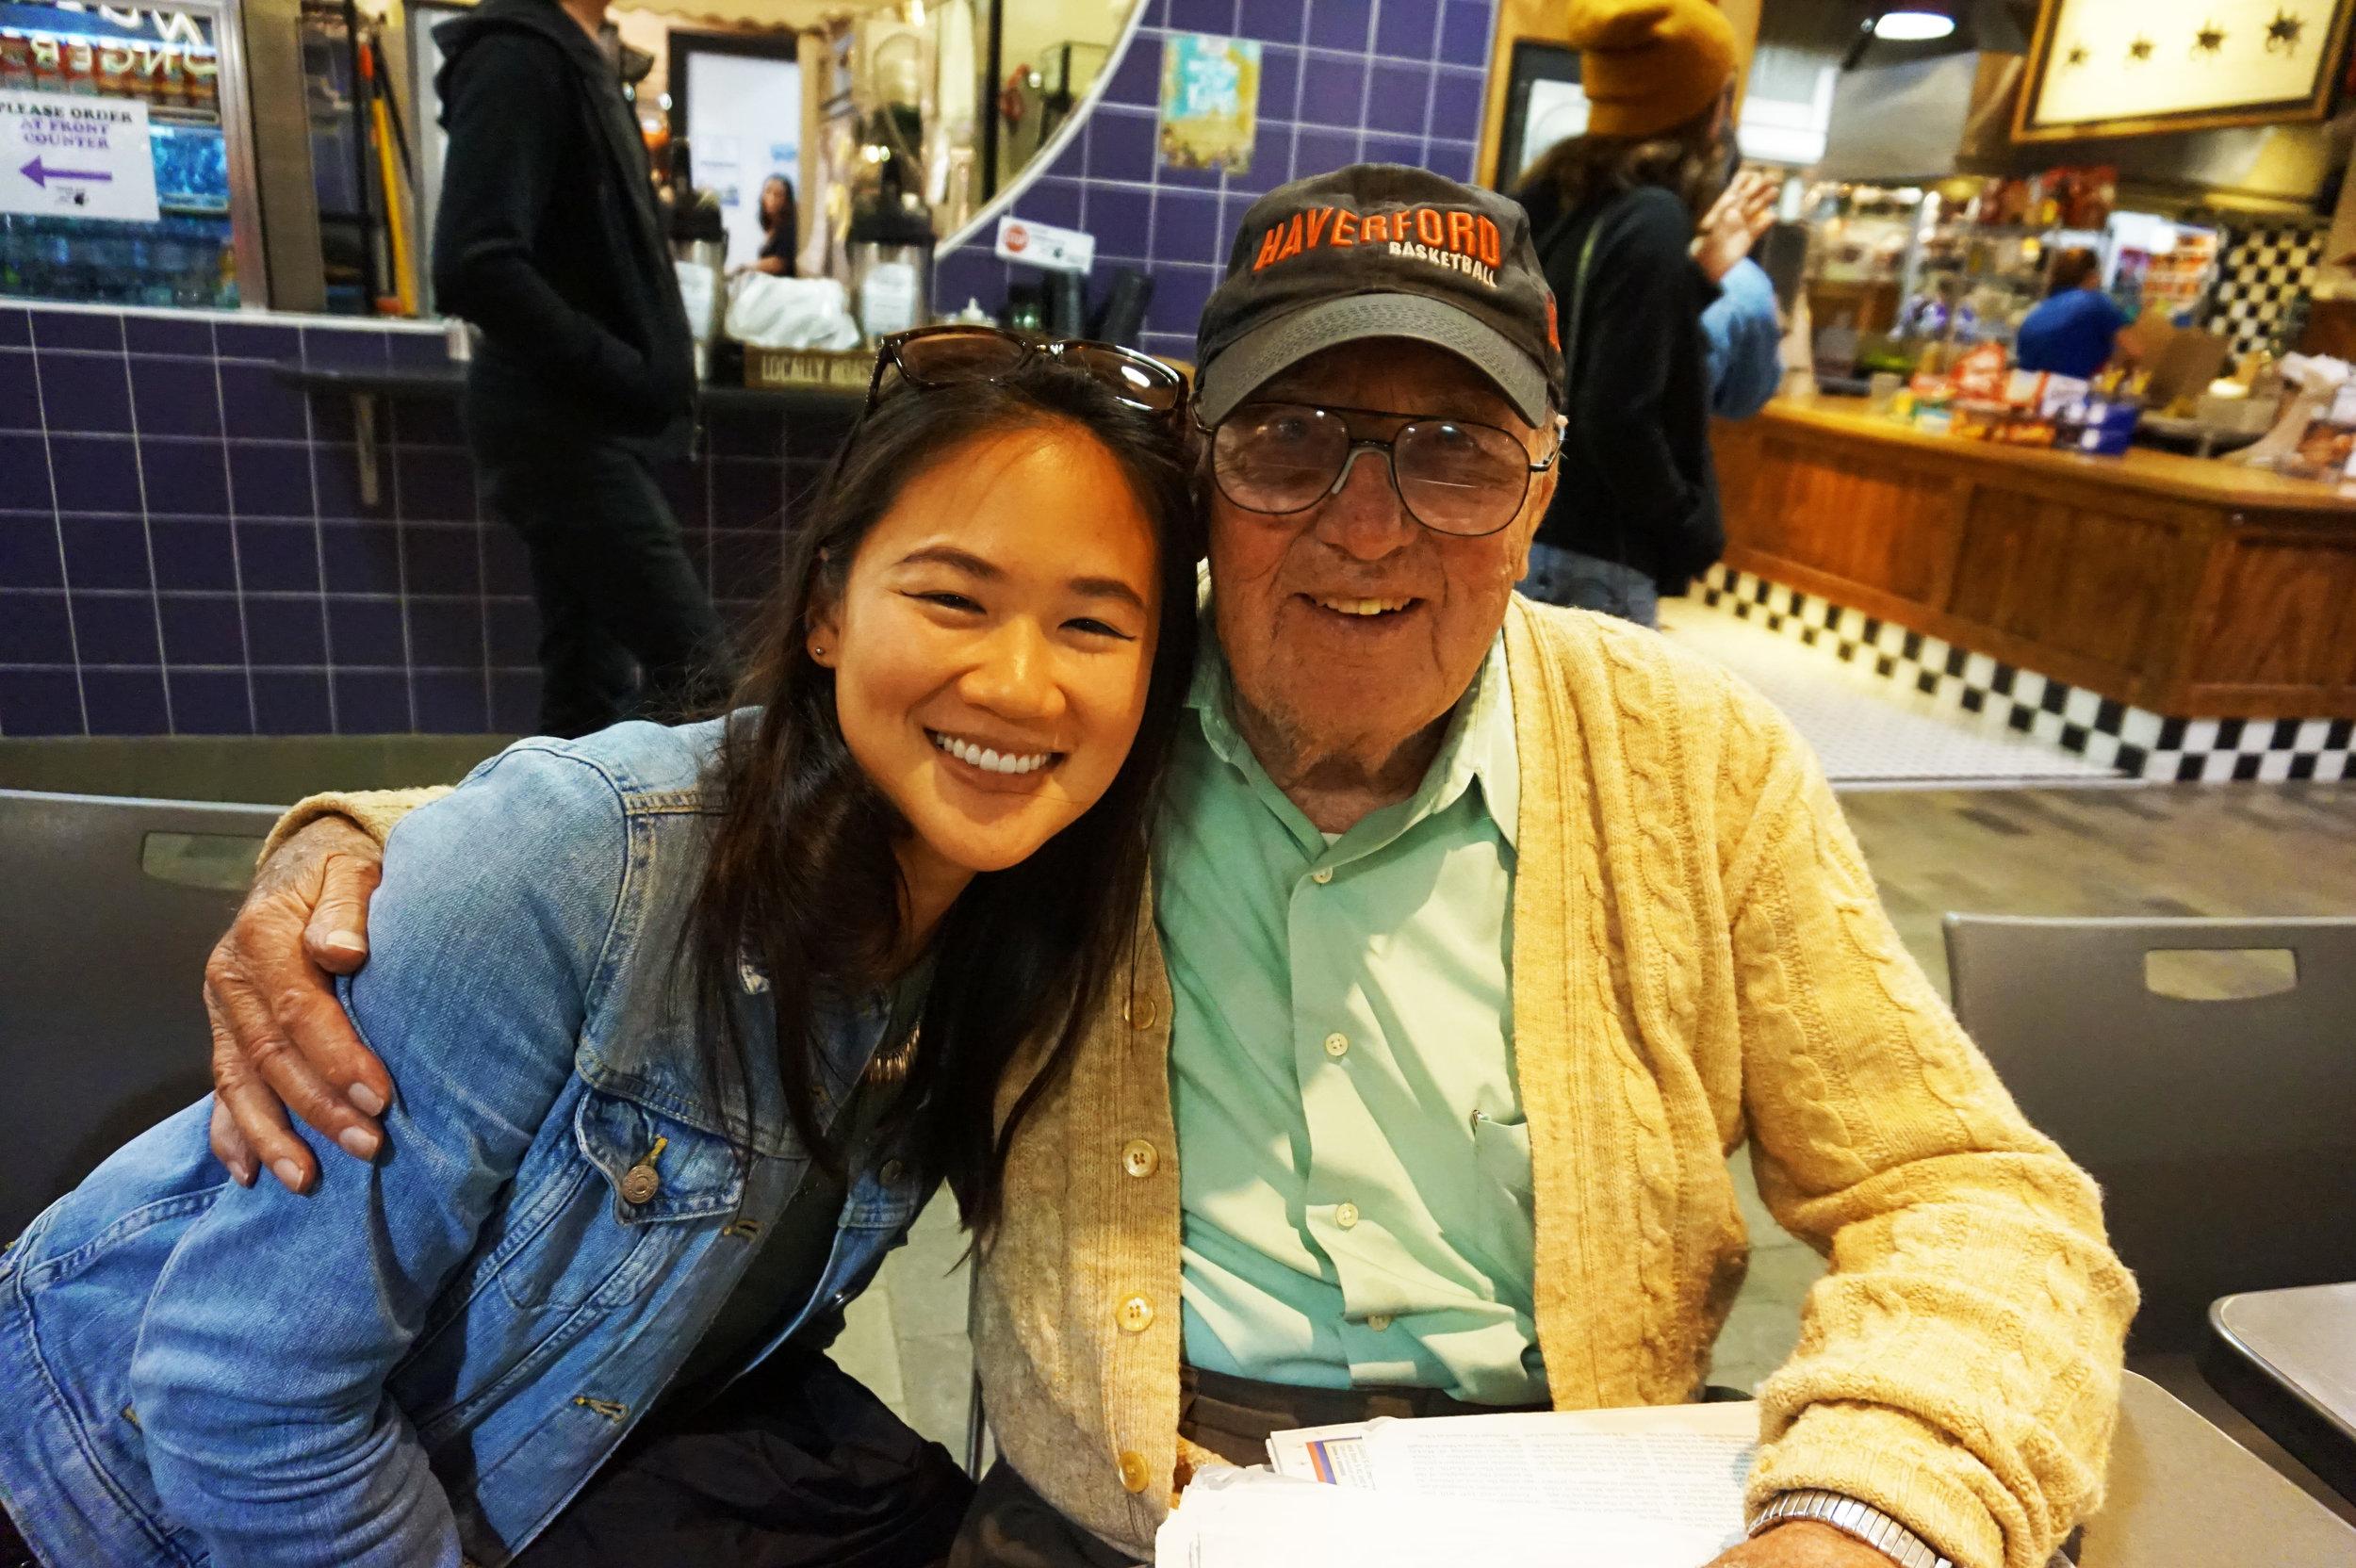 Chianna made a friend in a WWII veteran named George